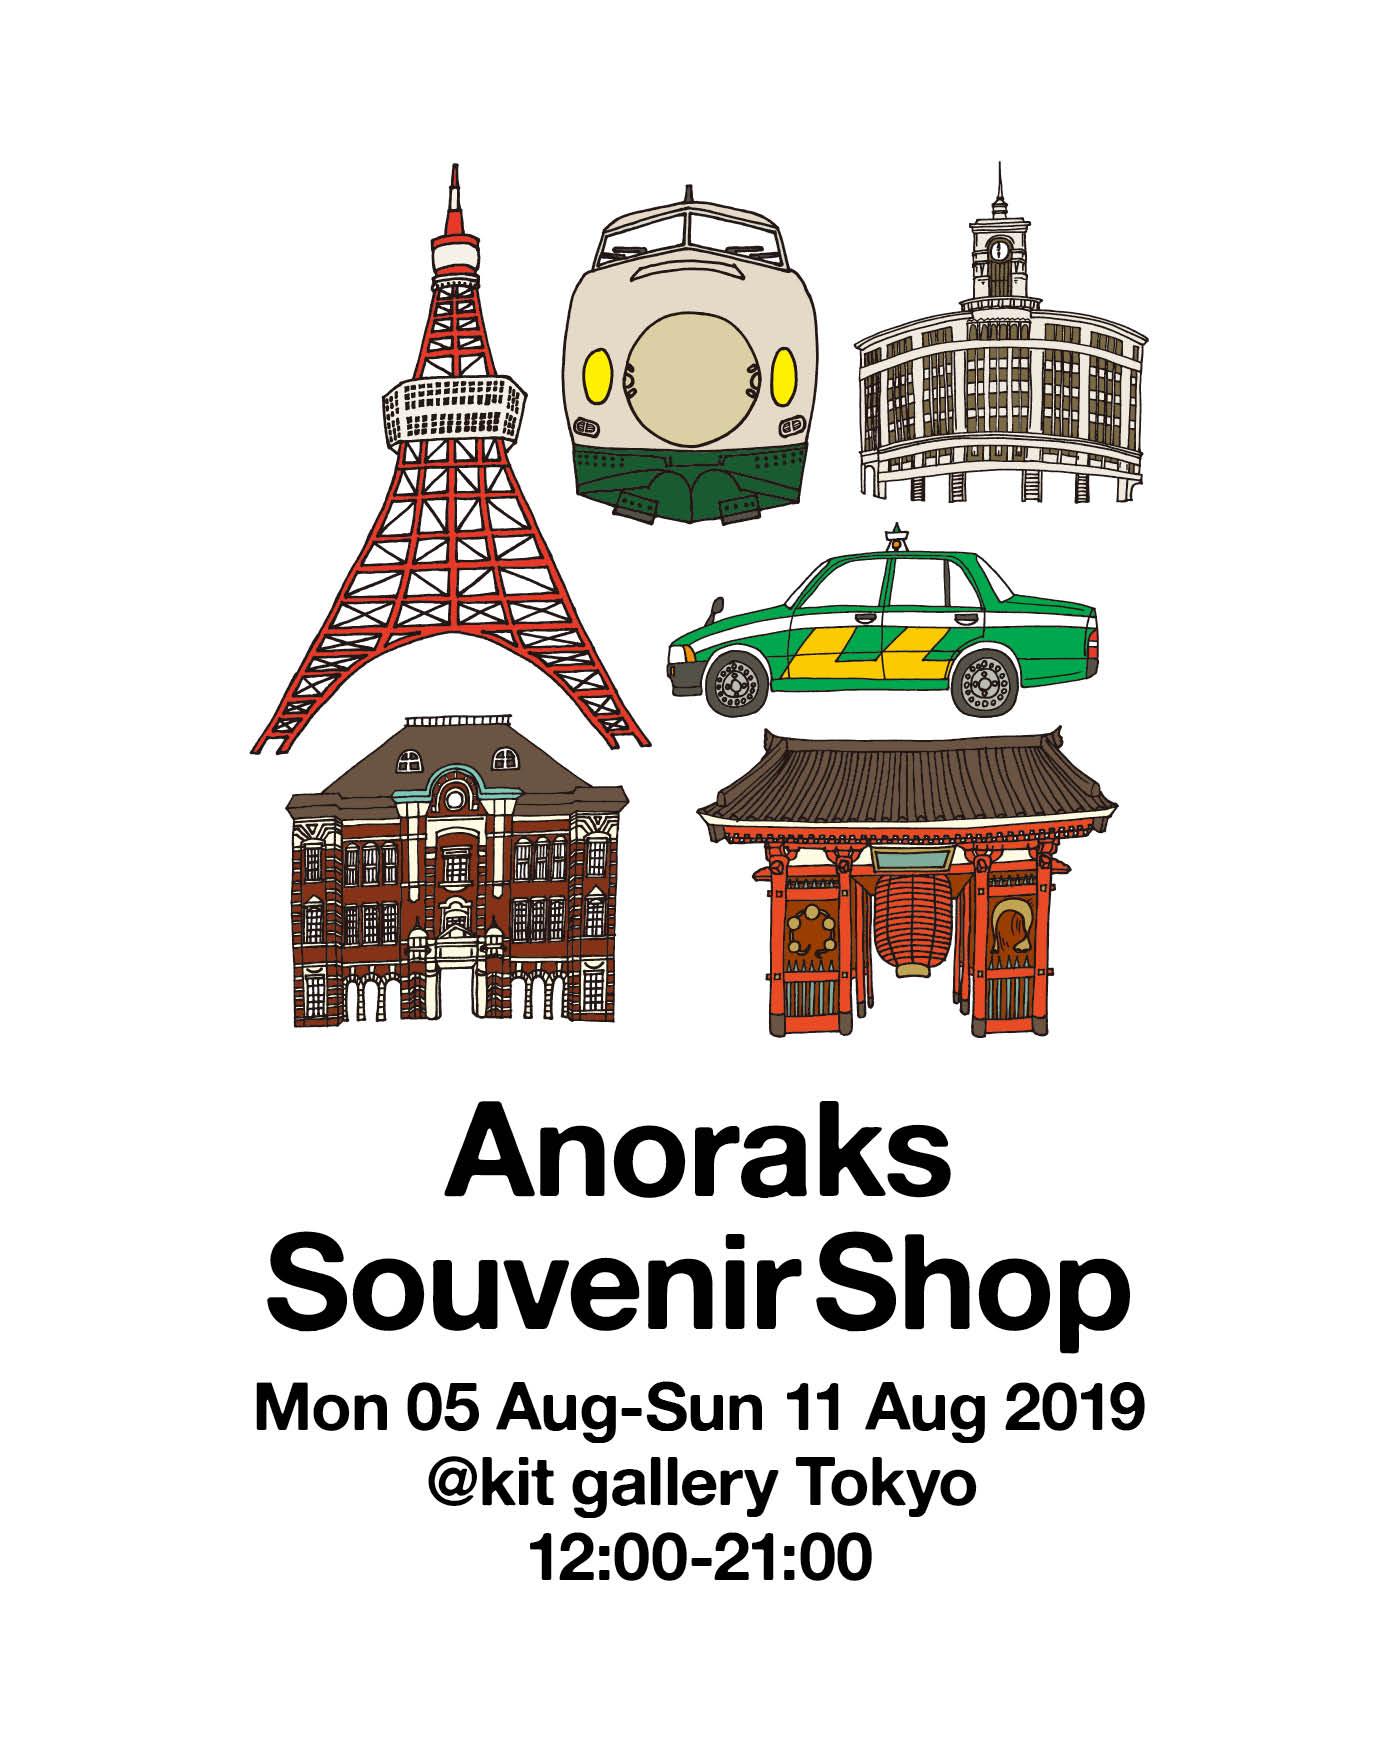 http://kit-gallery.com/schedule/files/20190805_ANORAKS_TOKYO_POPUP_FLY_INSTA.jpg